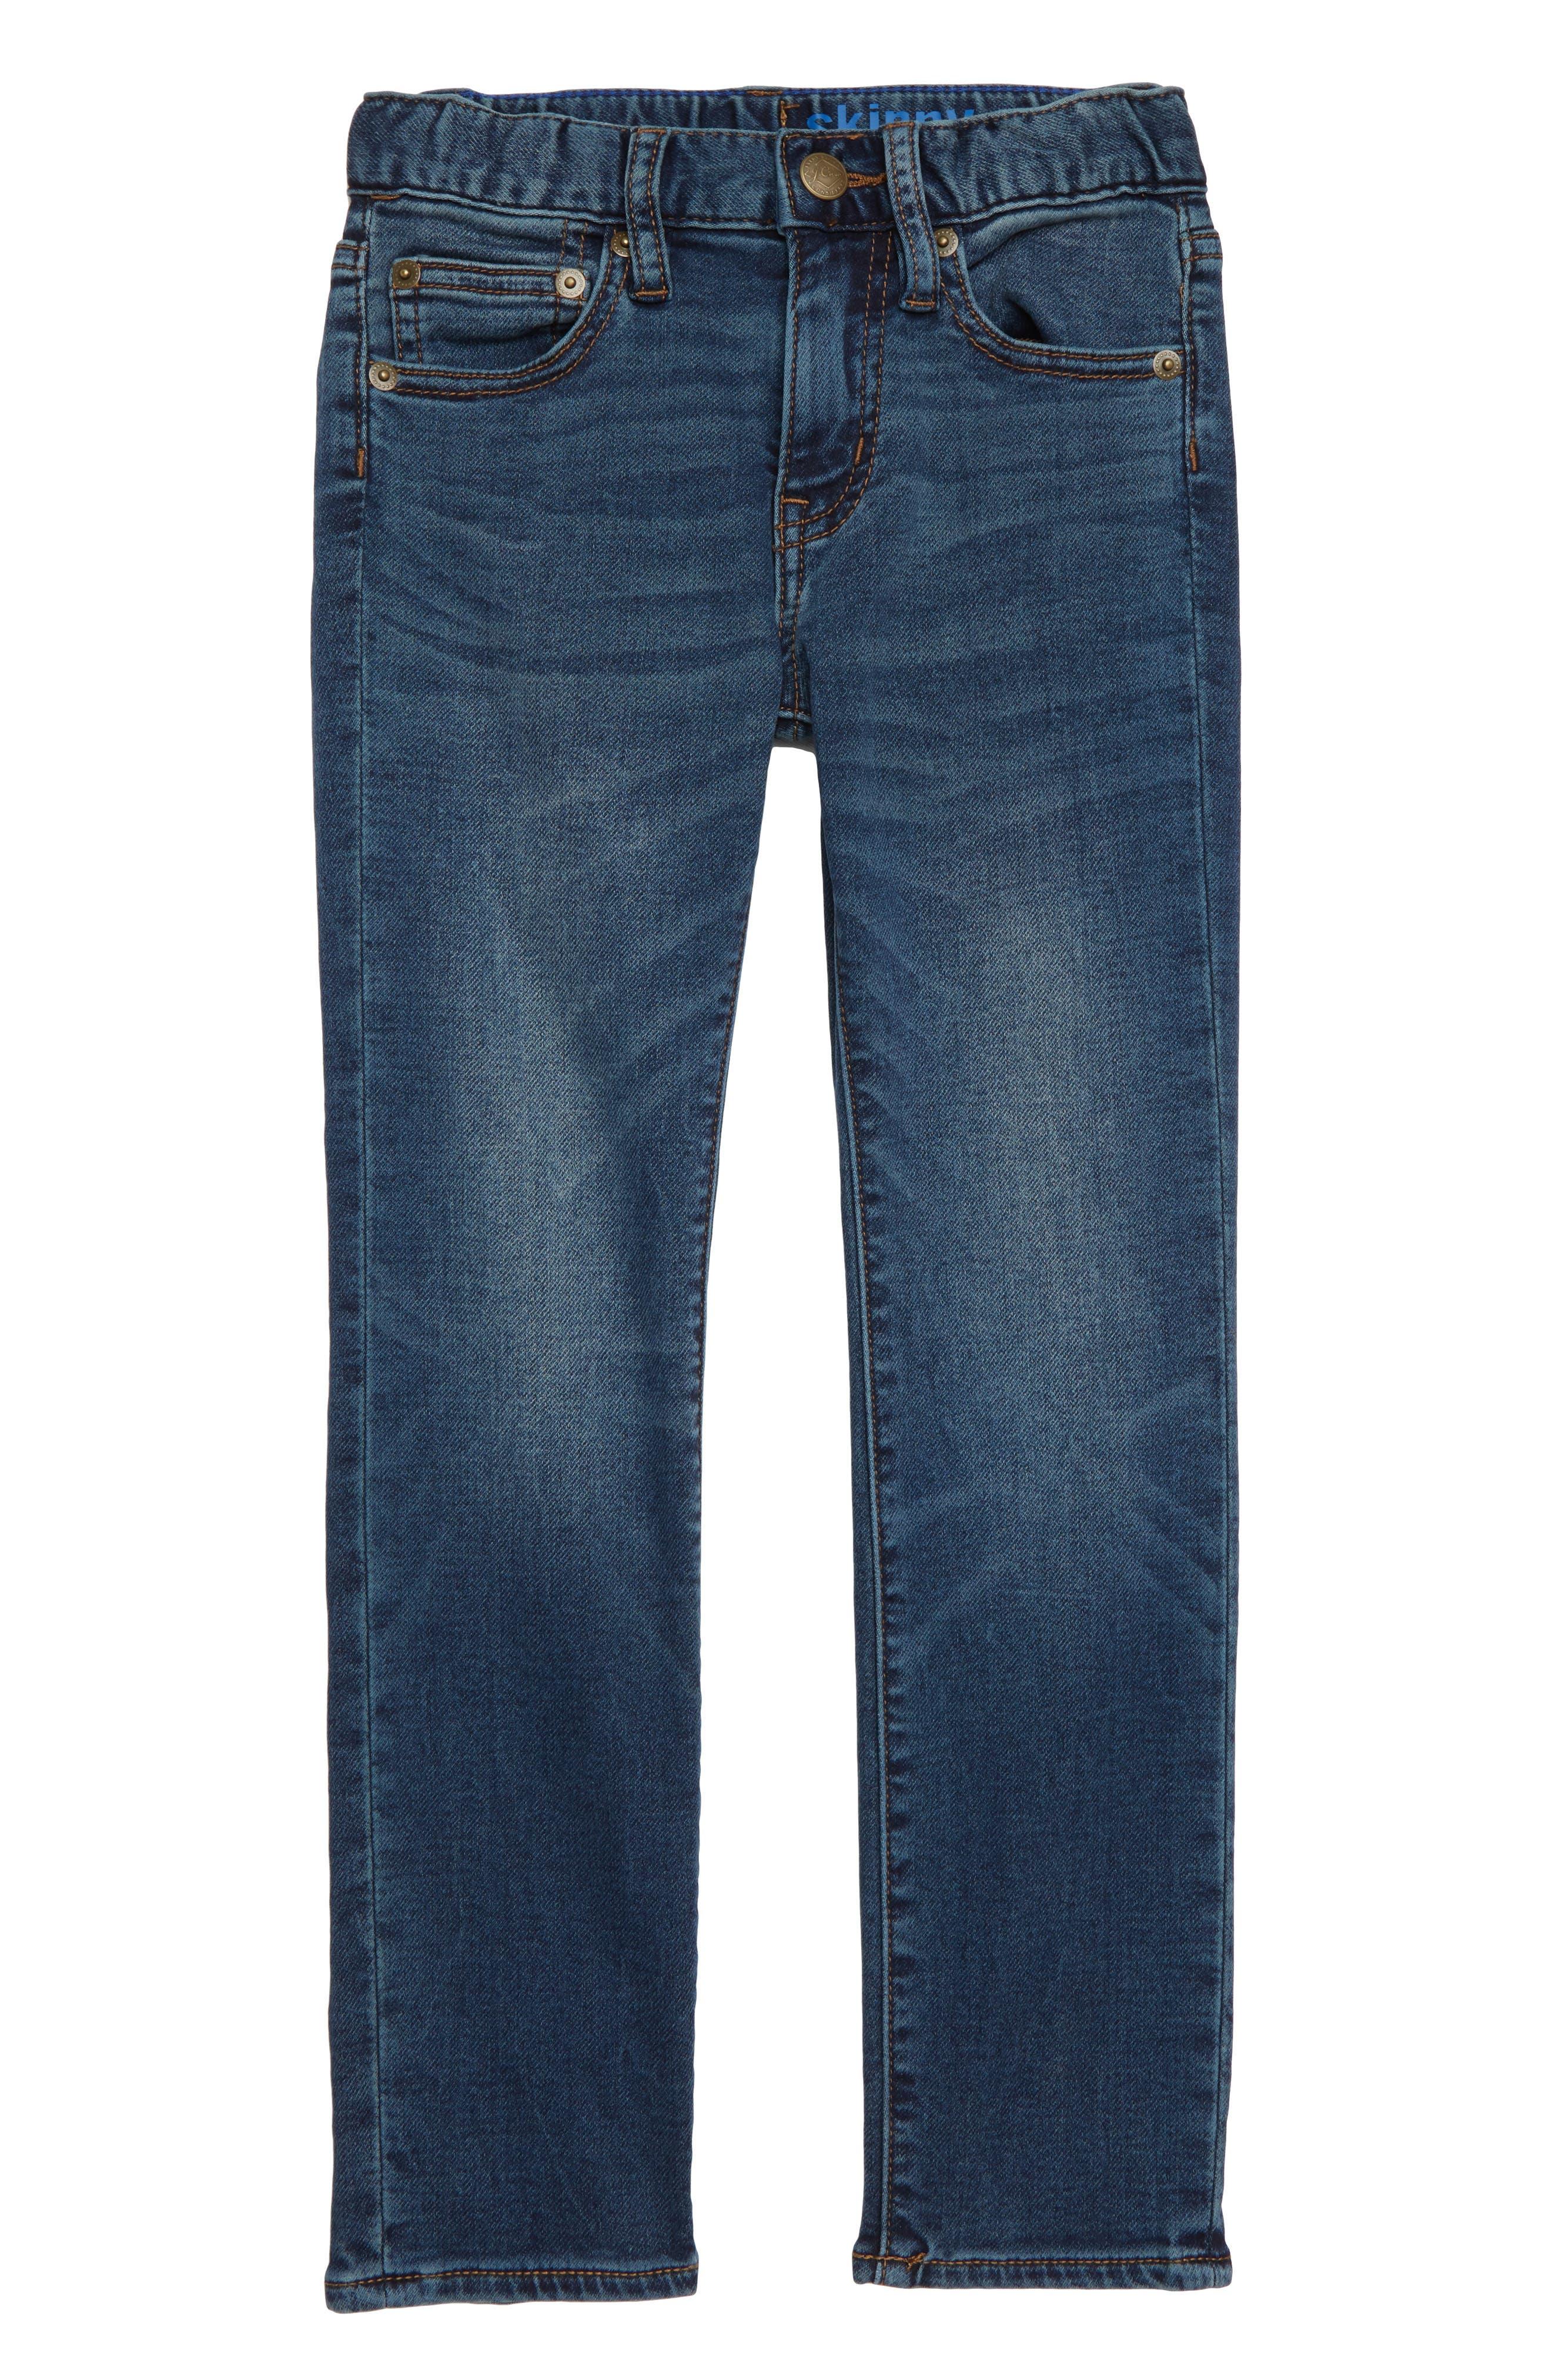 Runaround Skinny Jeans,                         Main,                         color, 400